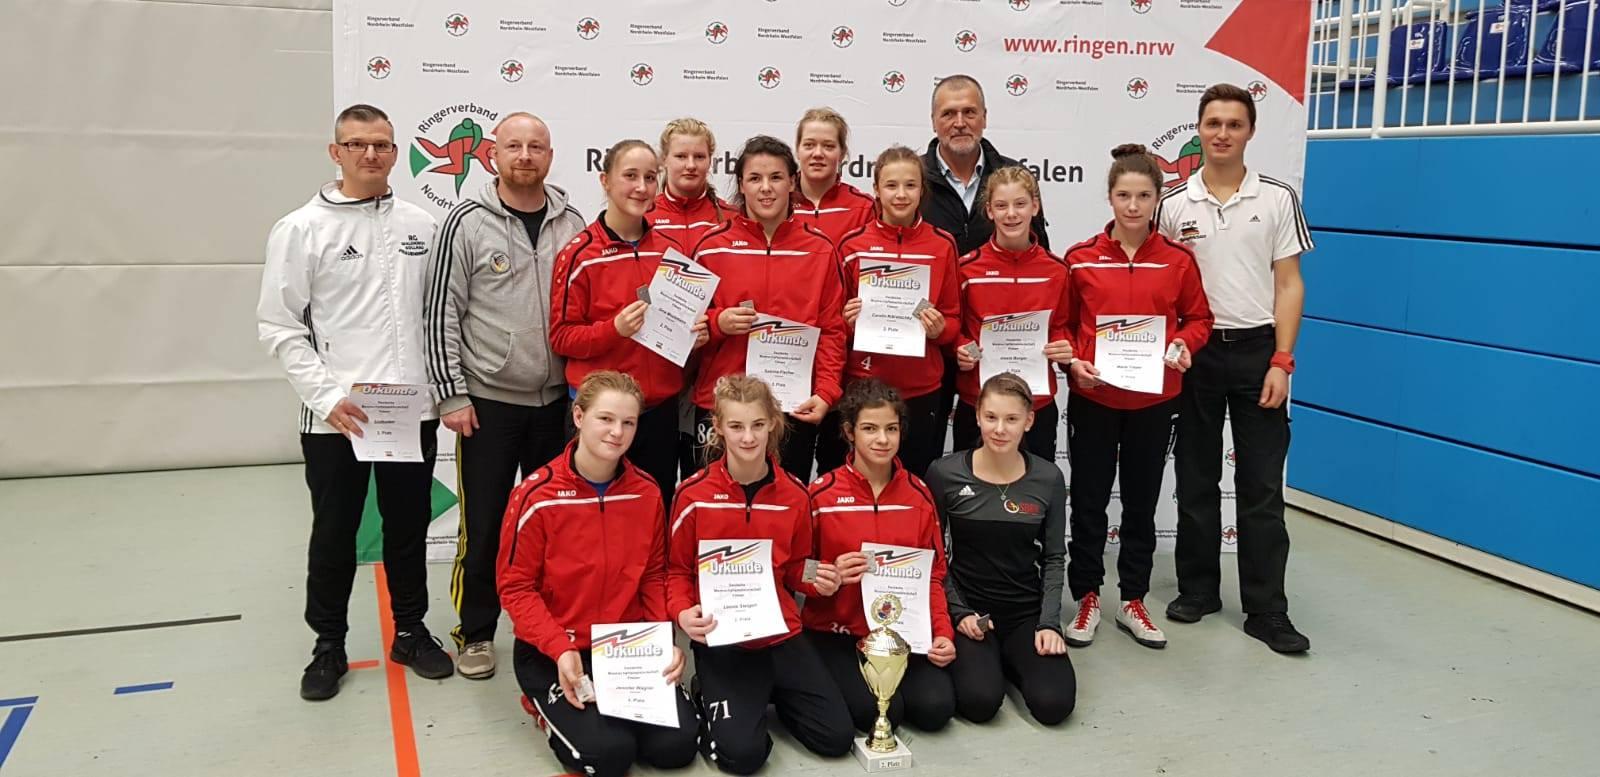 Chiara Hirt, KSV Gottmadingen mit Team Südbaden 2018